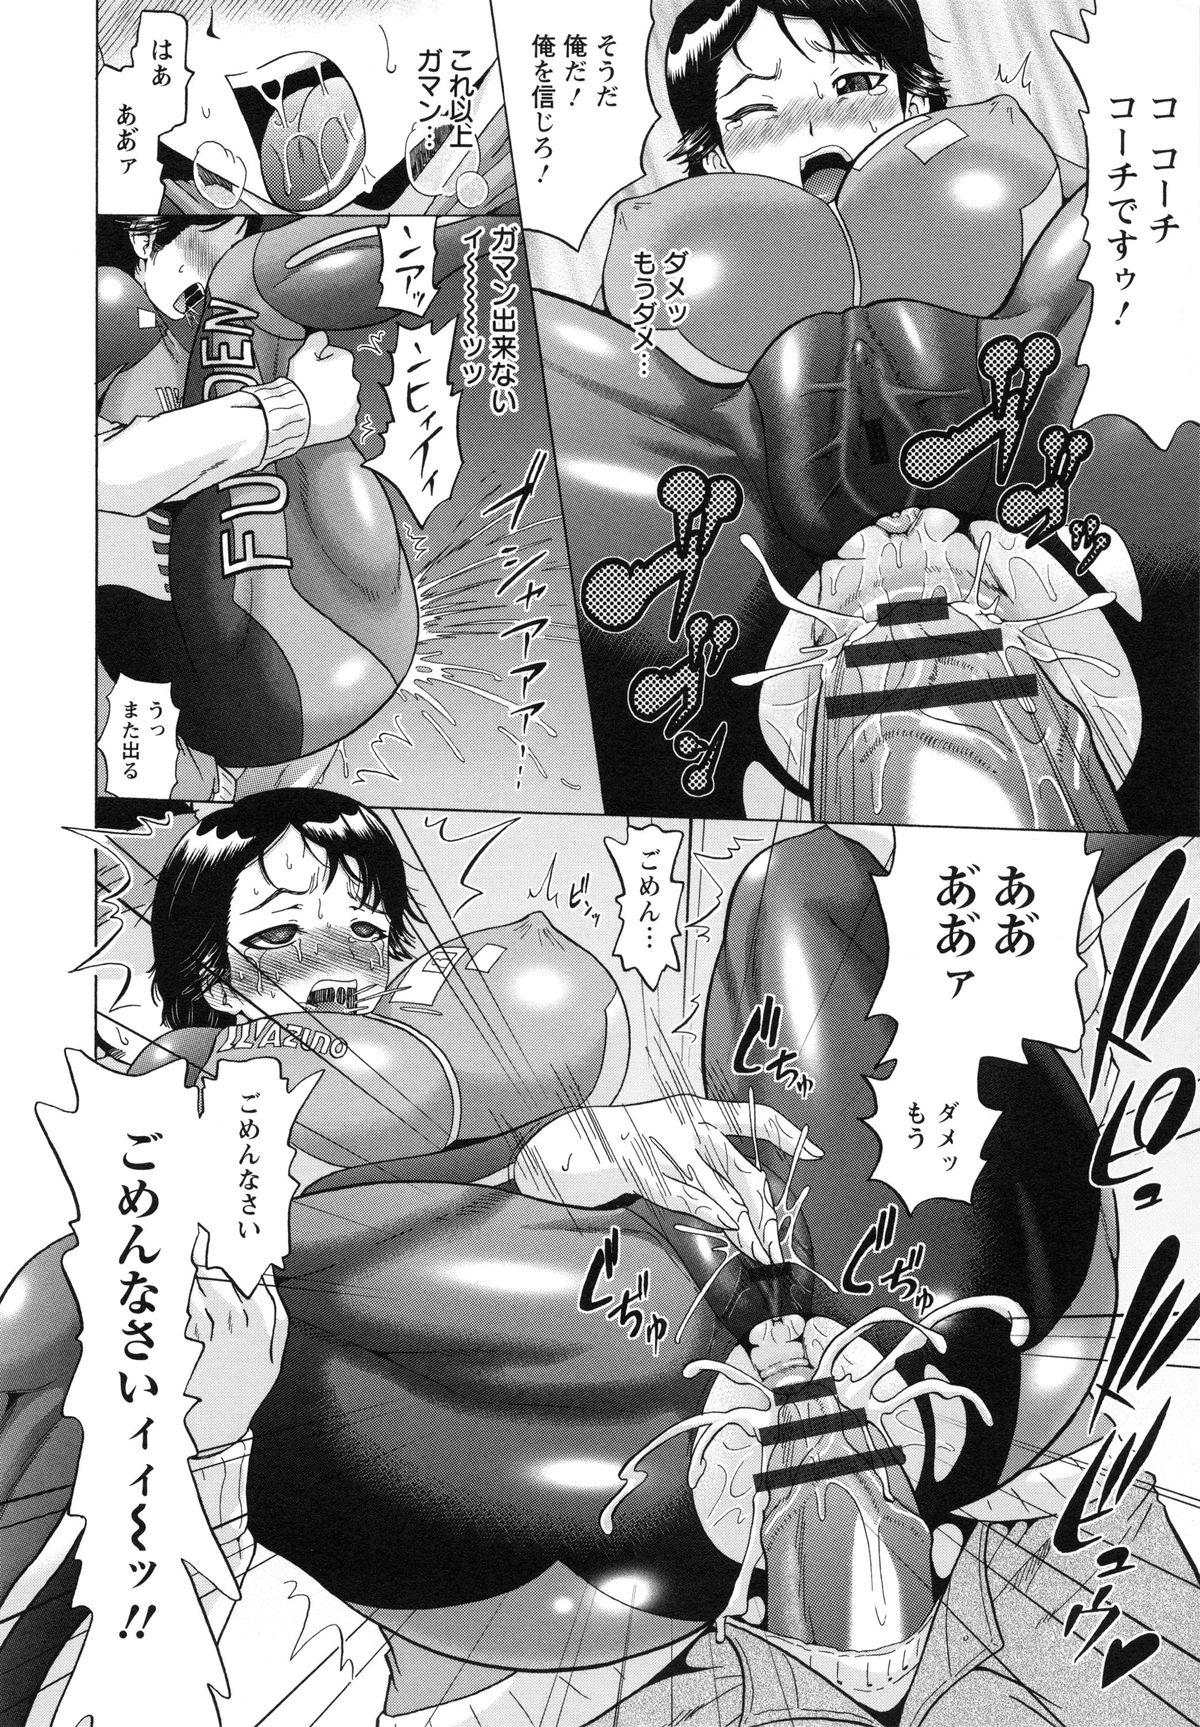 [Nukunuku Orange] Seikou ~Maeana Kanzen Houchi~ - Keep Anus in Anguish!!!! 109